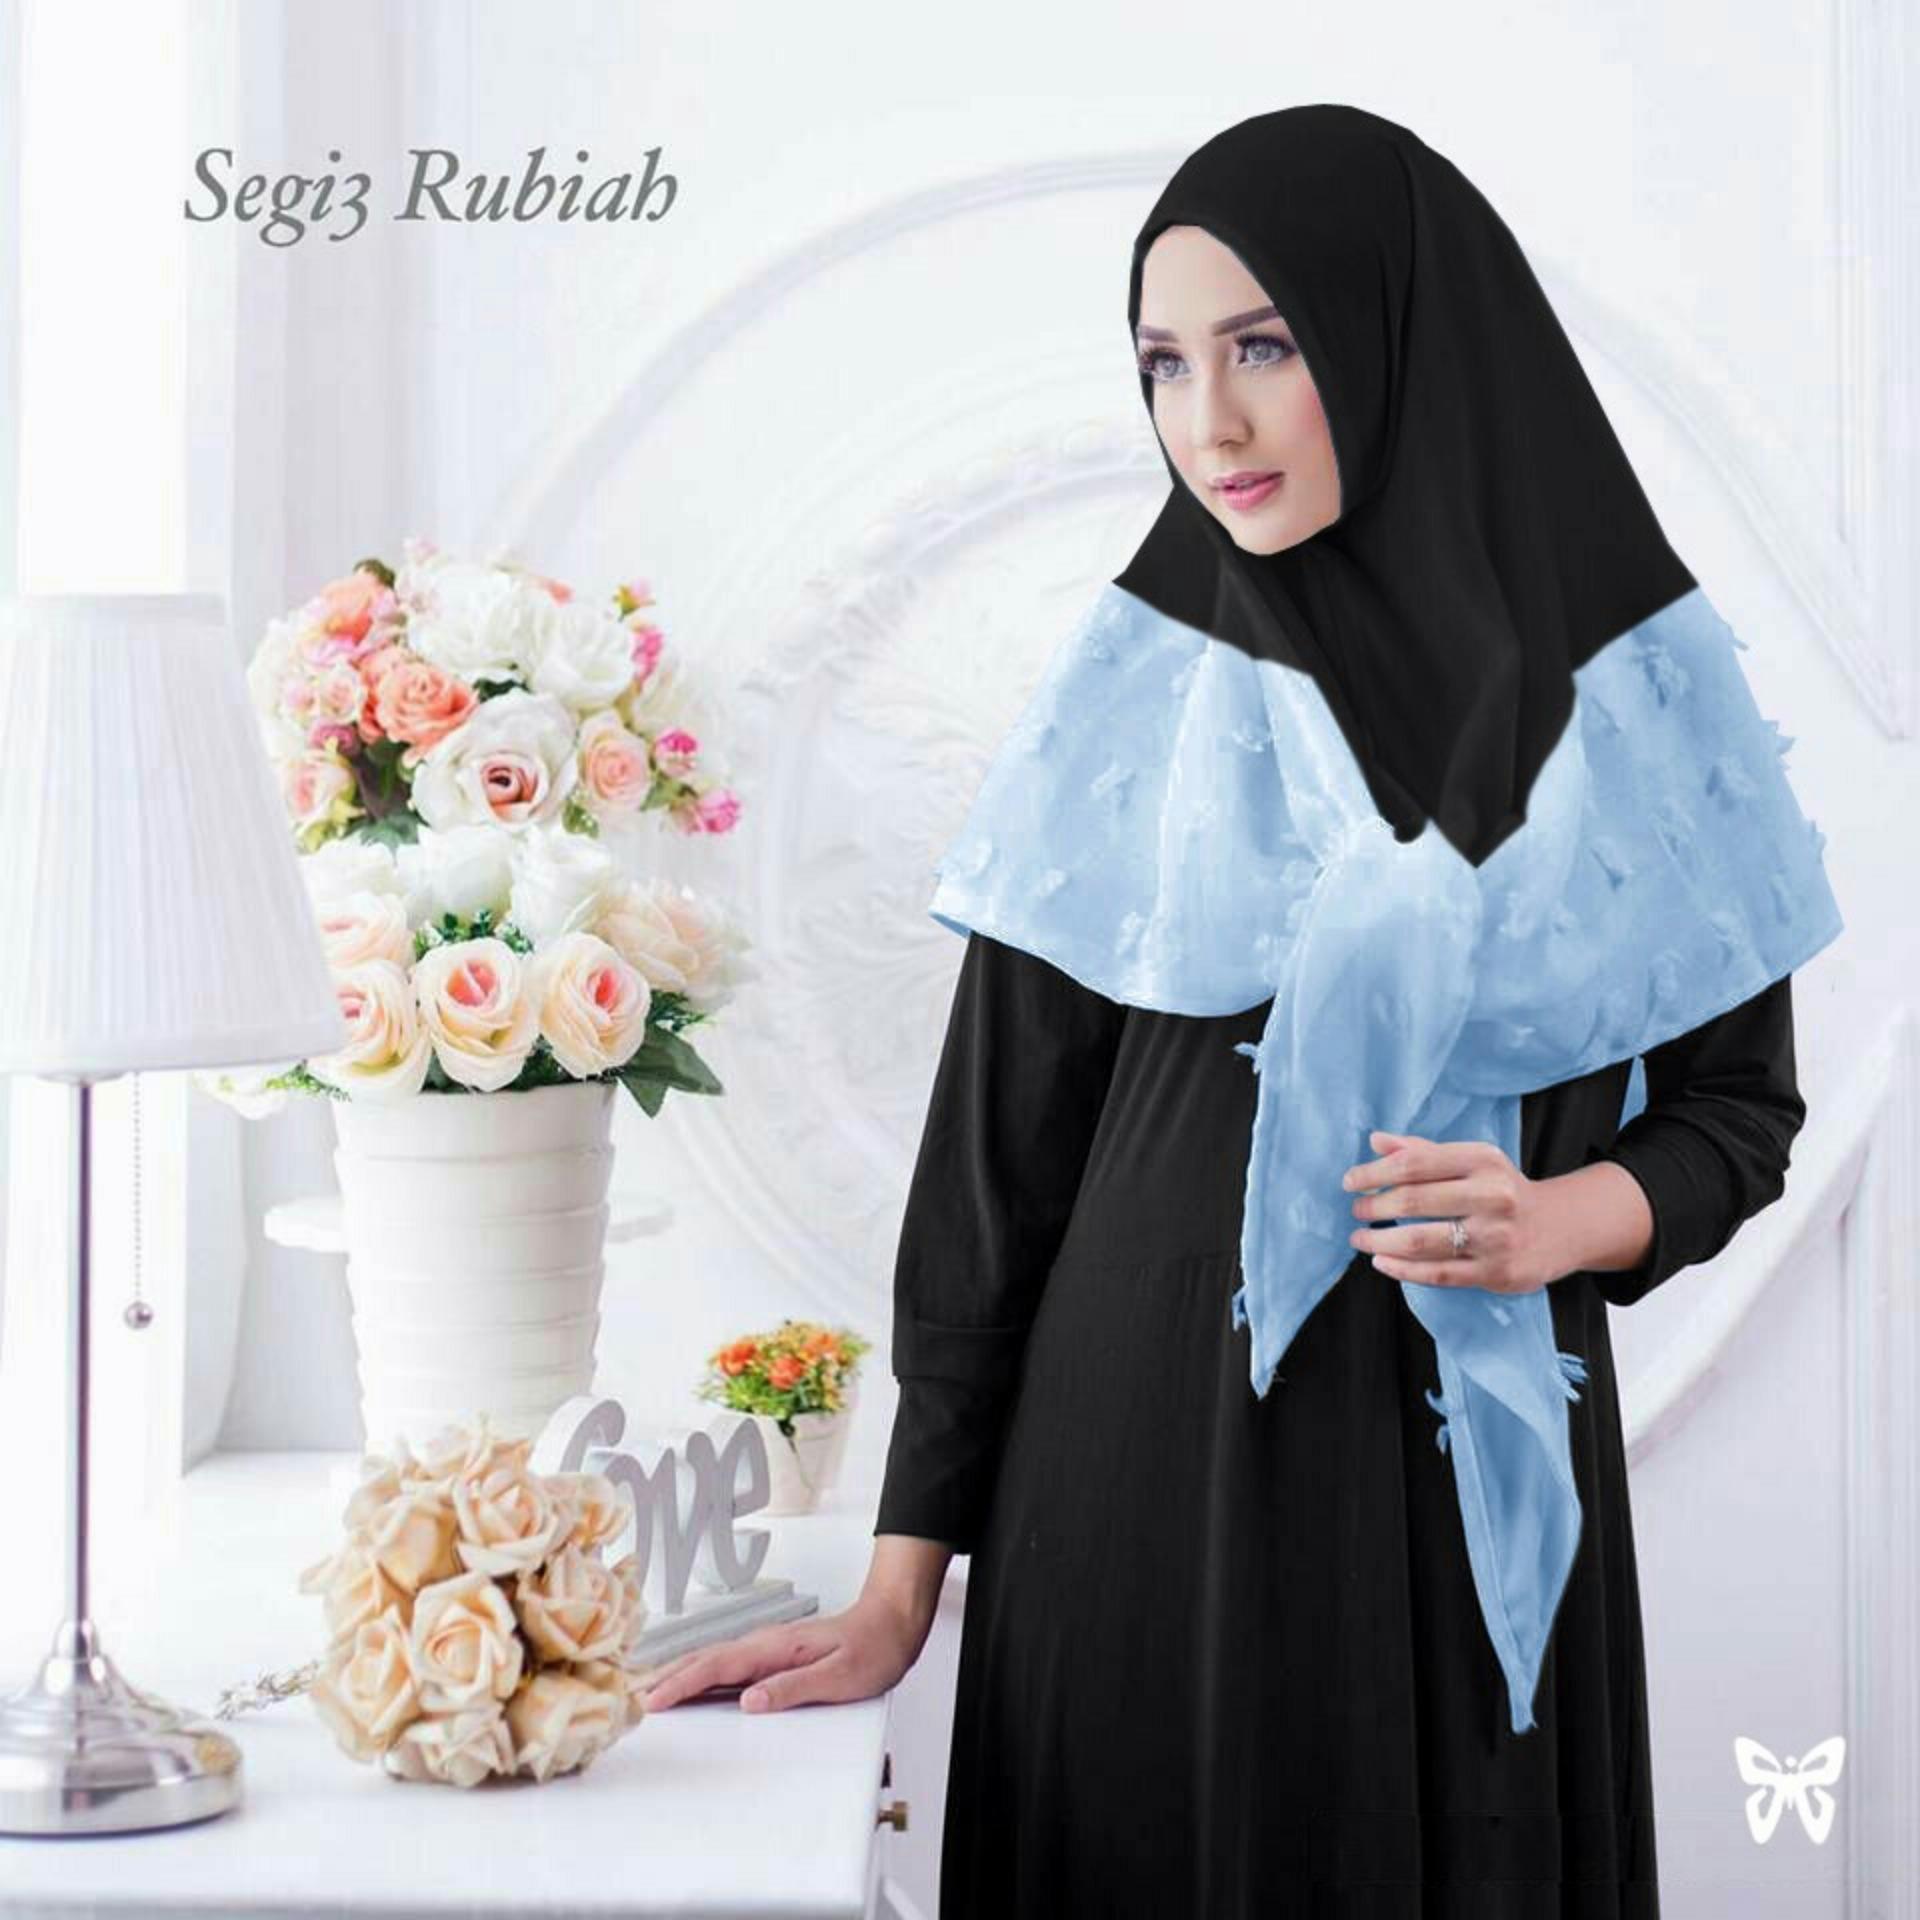 Harga Jual Hijab Jilbab Instant Rubiah Bunga Dan Update Baru Kerudung Tammia Instan Kedai Baju Segitiga Biru R